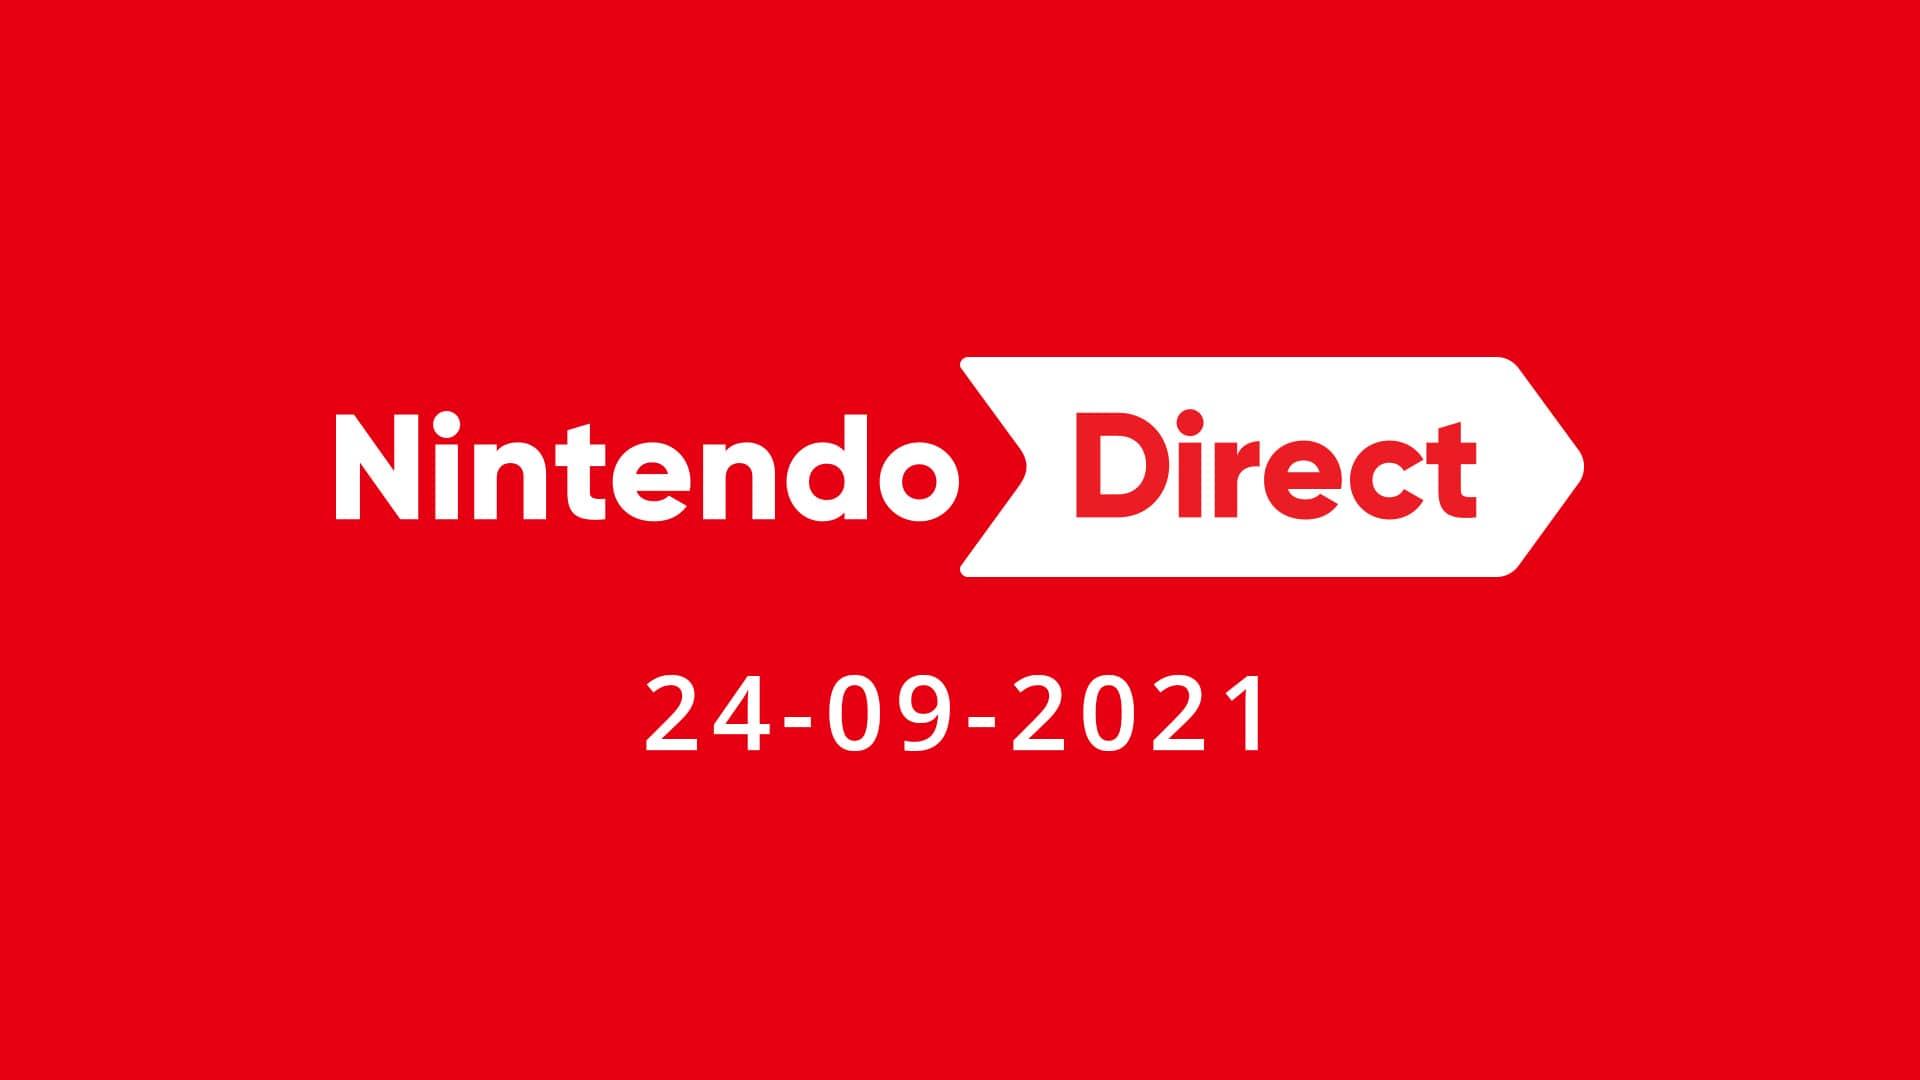 Nintendo Direct 24-09-2021